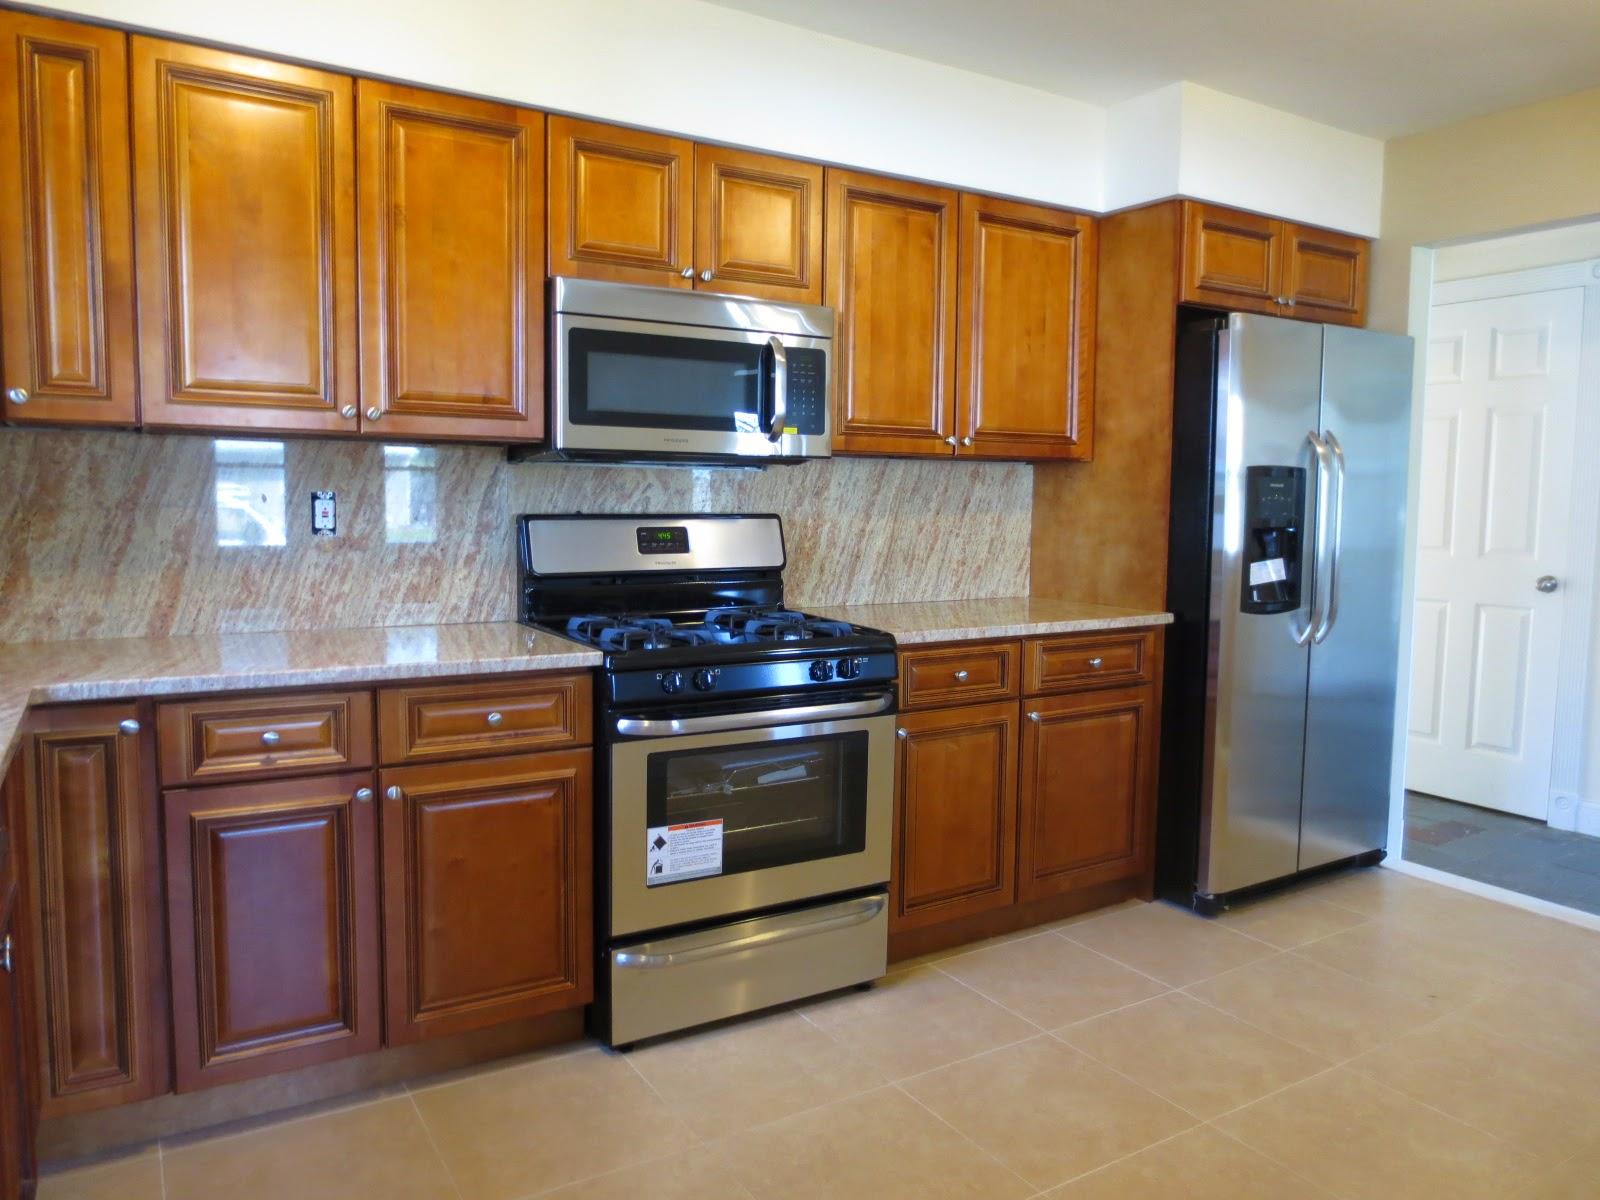 http://www.centralnjhomesforsale.com/listing/mlsid/291/propertyid/21436615/